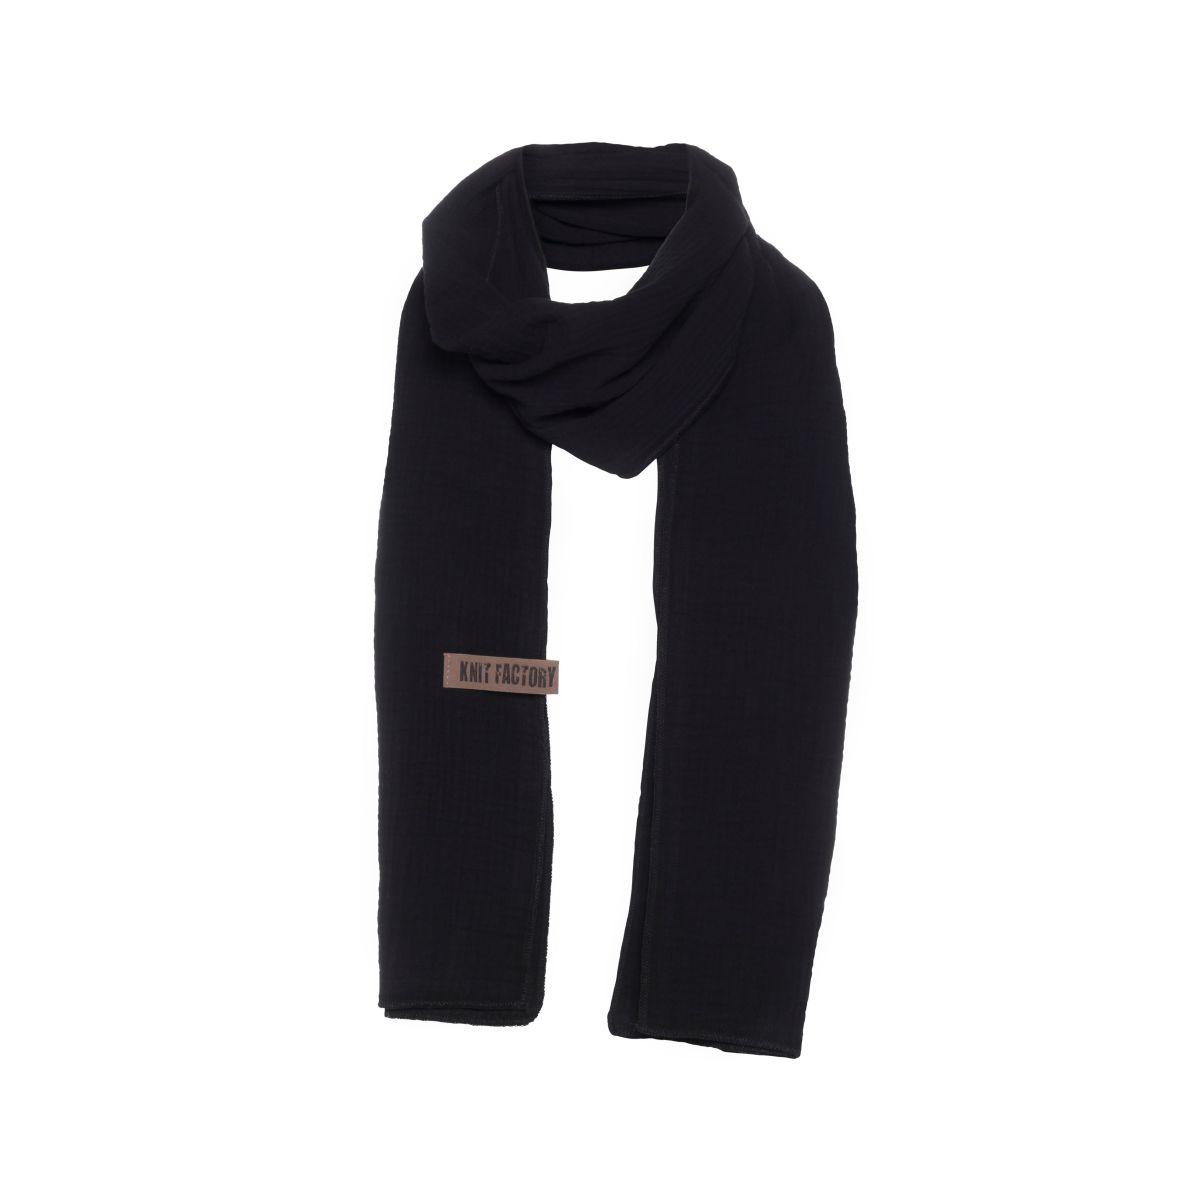 liv sjaal zwart